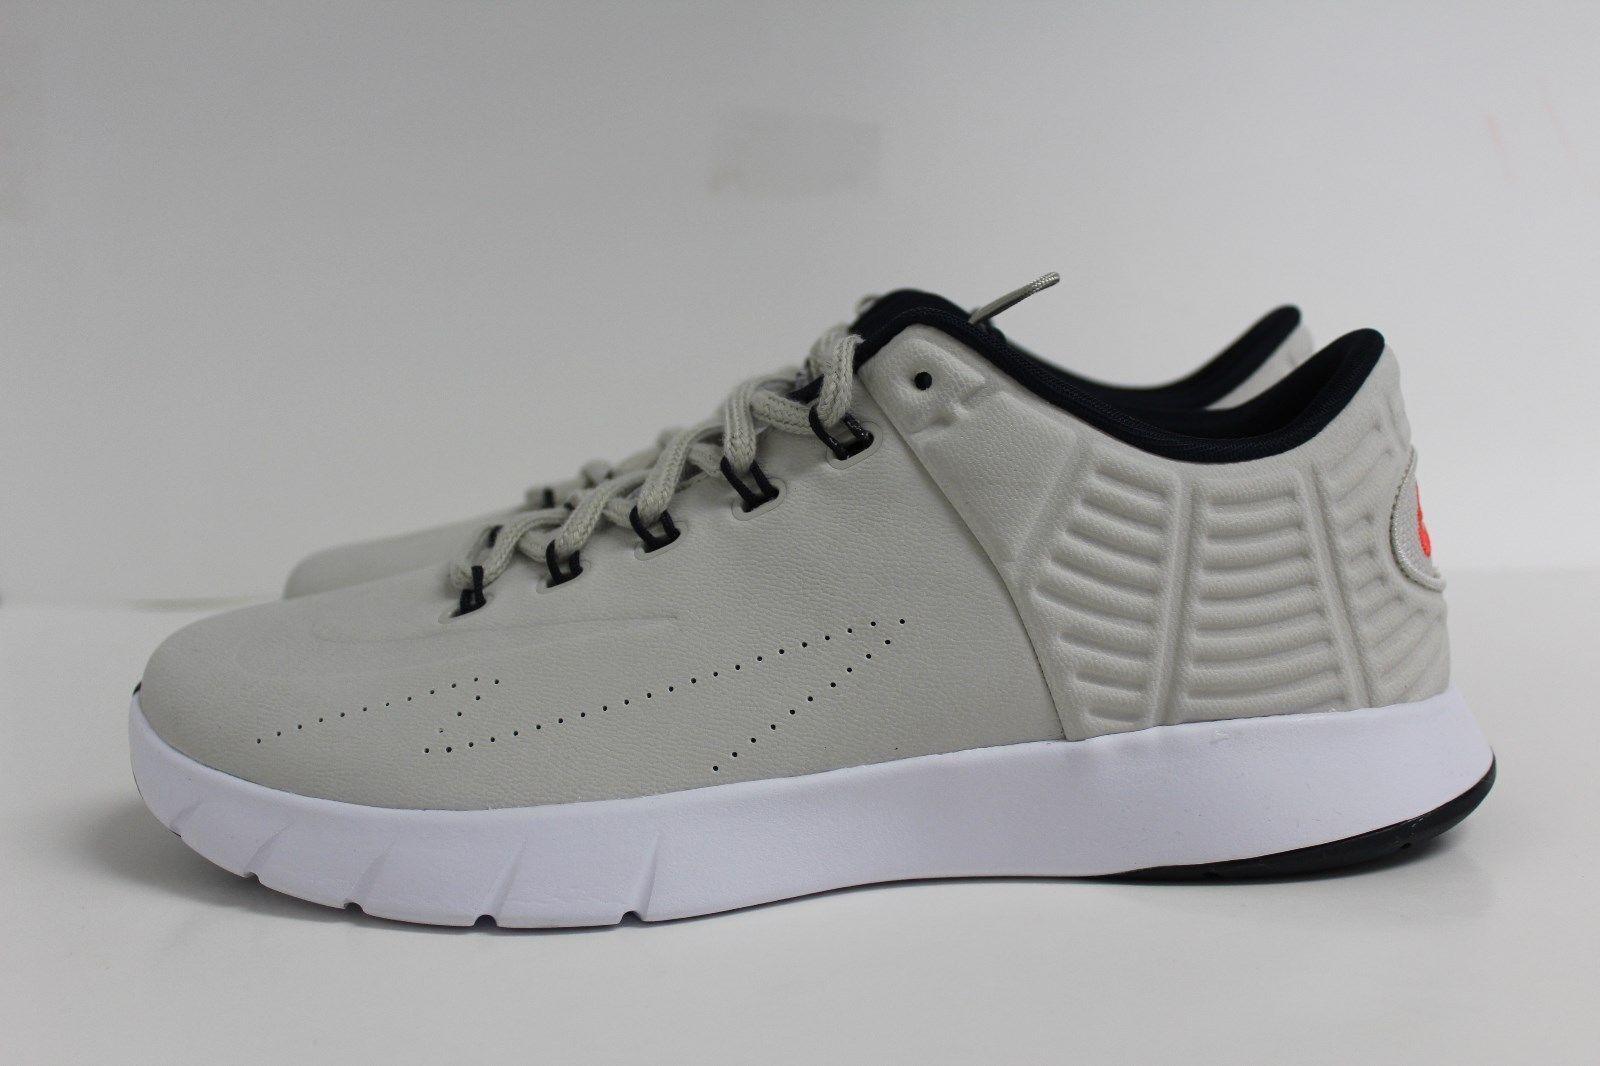 Nike hyperrev lunare bassa ext scarpe da uomo luce ossa 802557 003